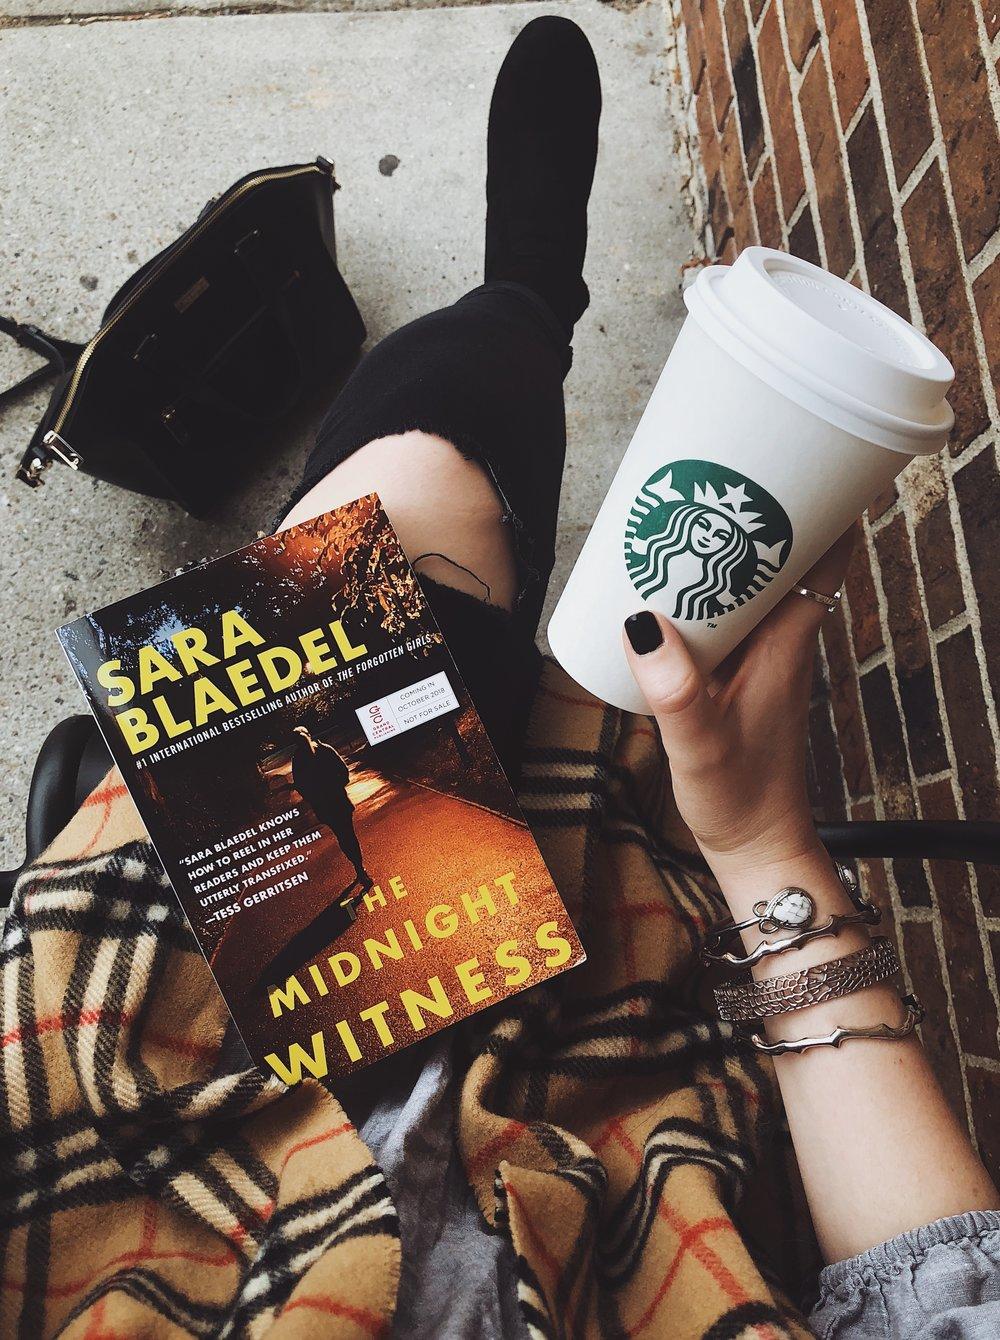 Sara Blaedel The Midnight Witness.JPG